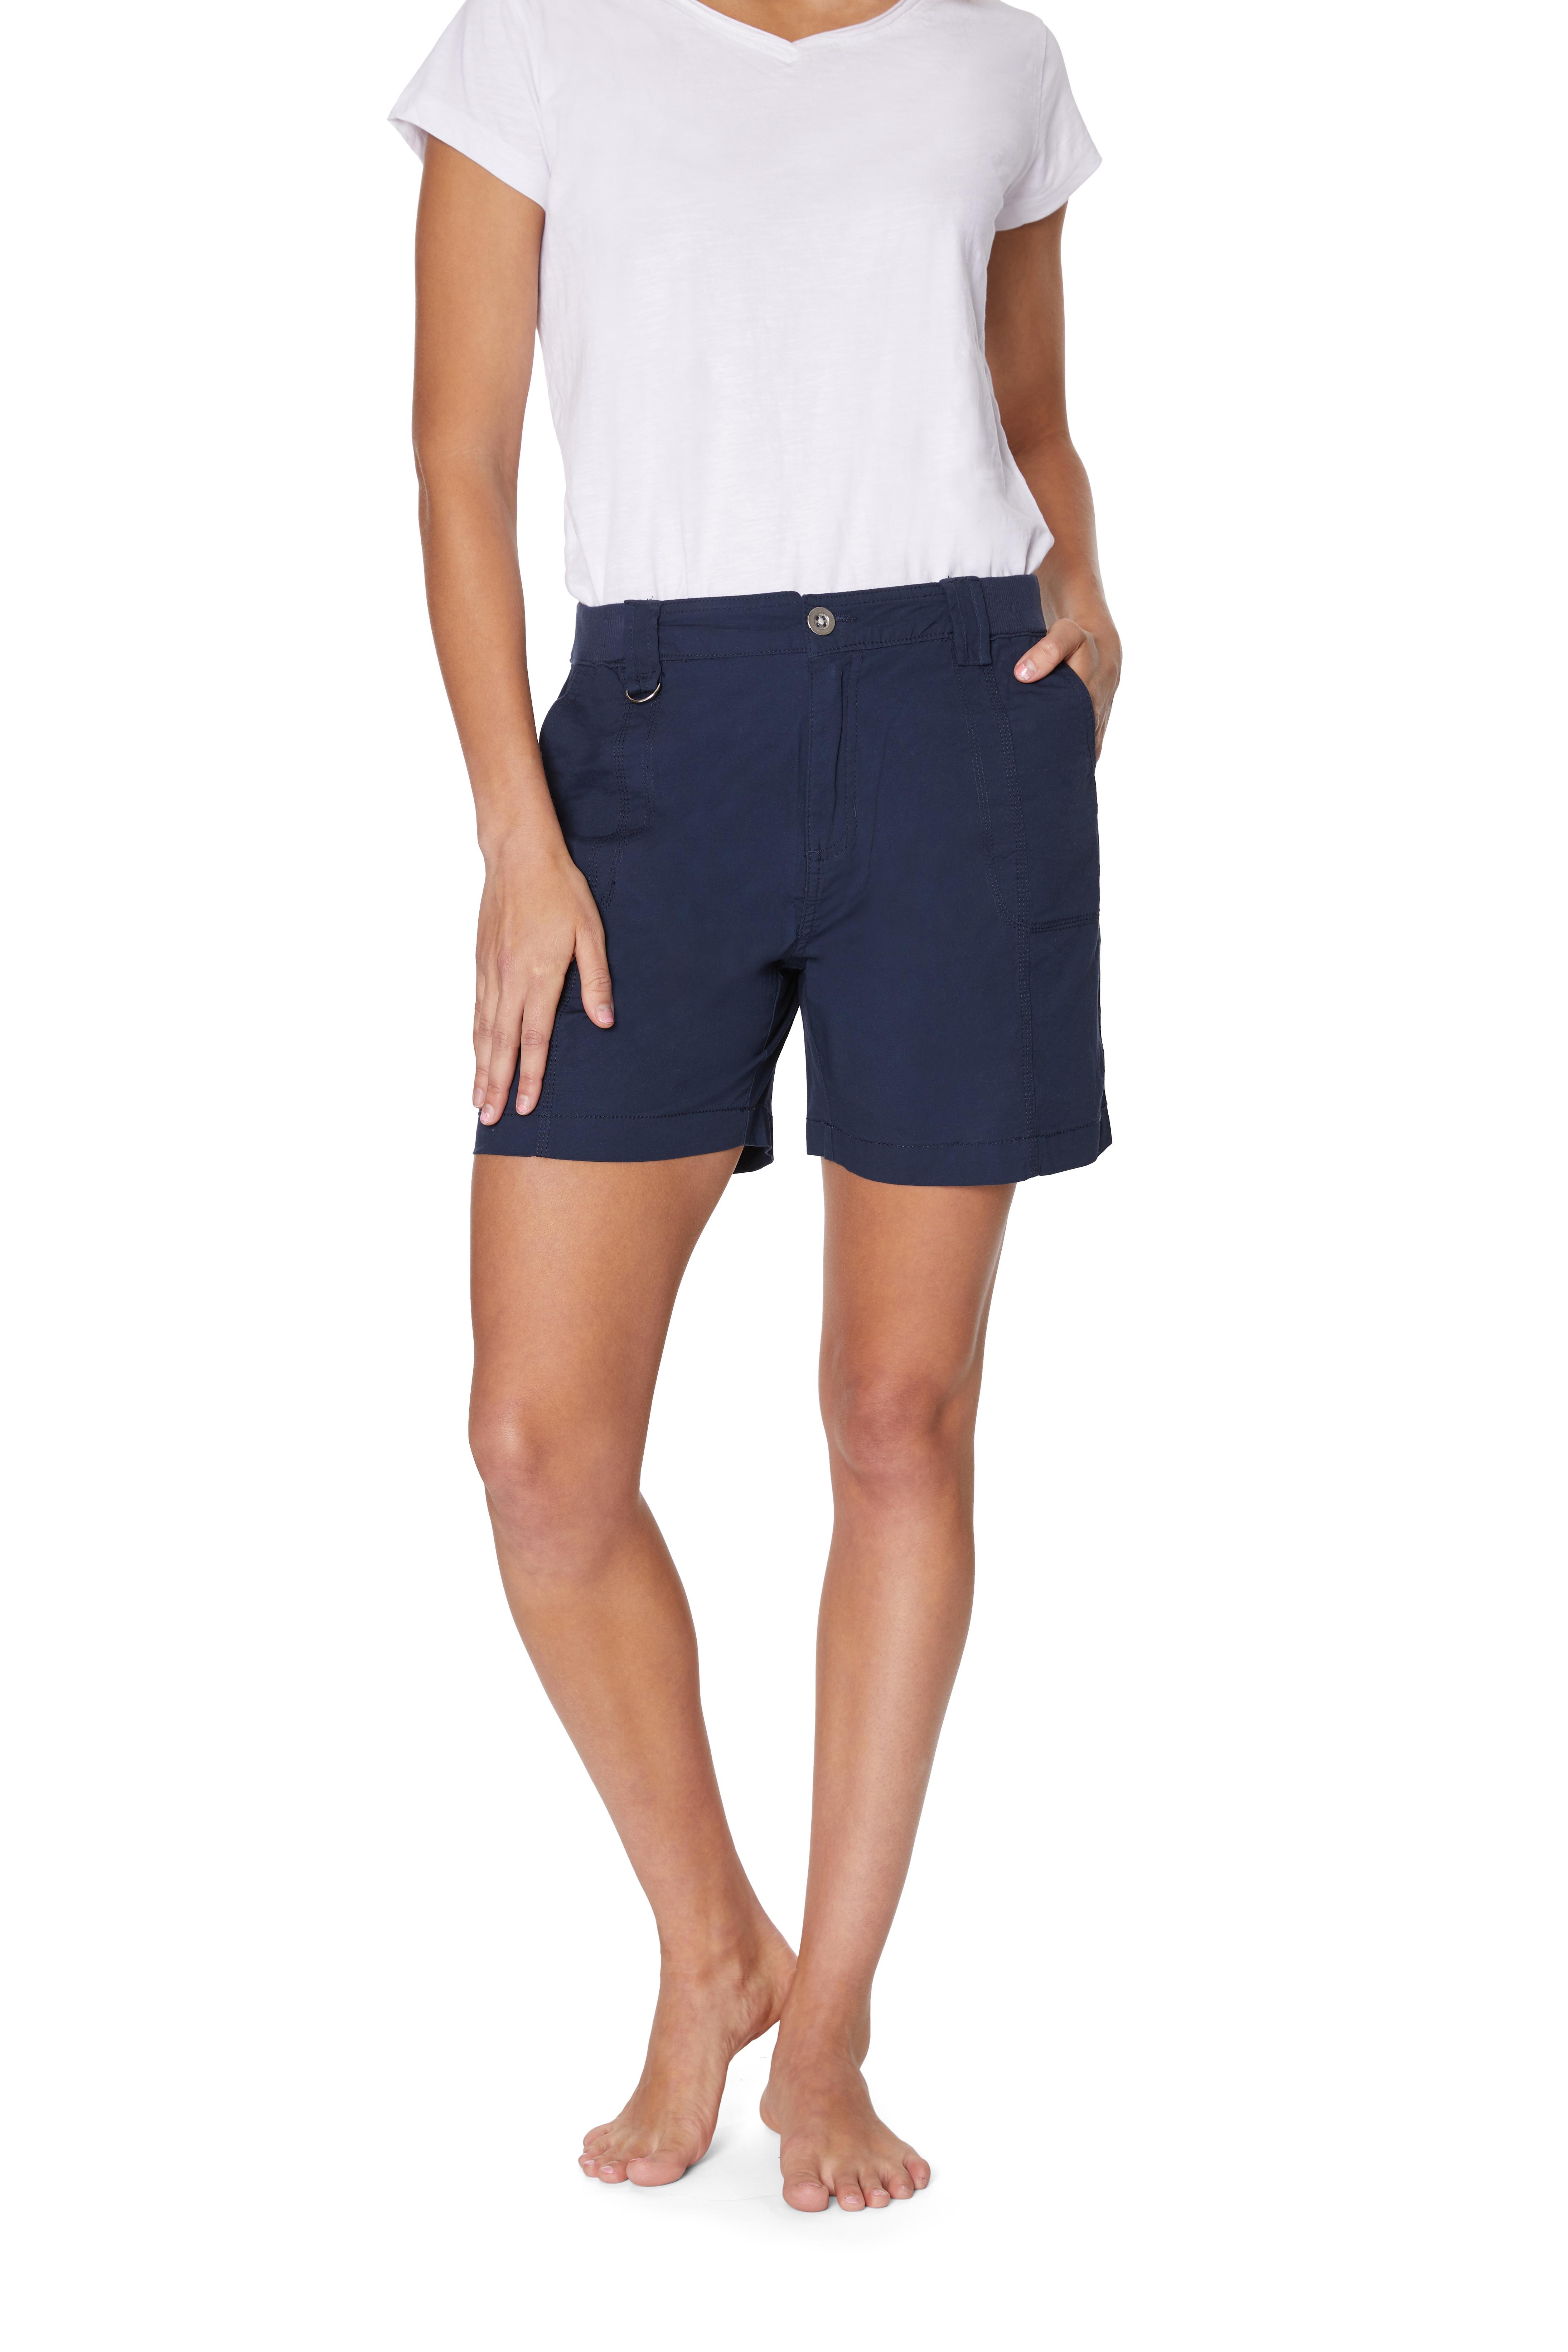 Caribbean Joe® Cotton Short -Navy - Front